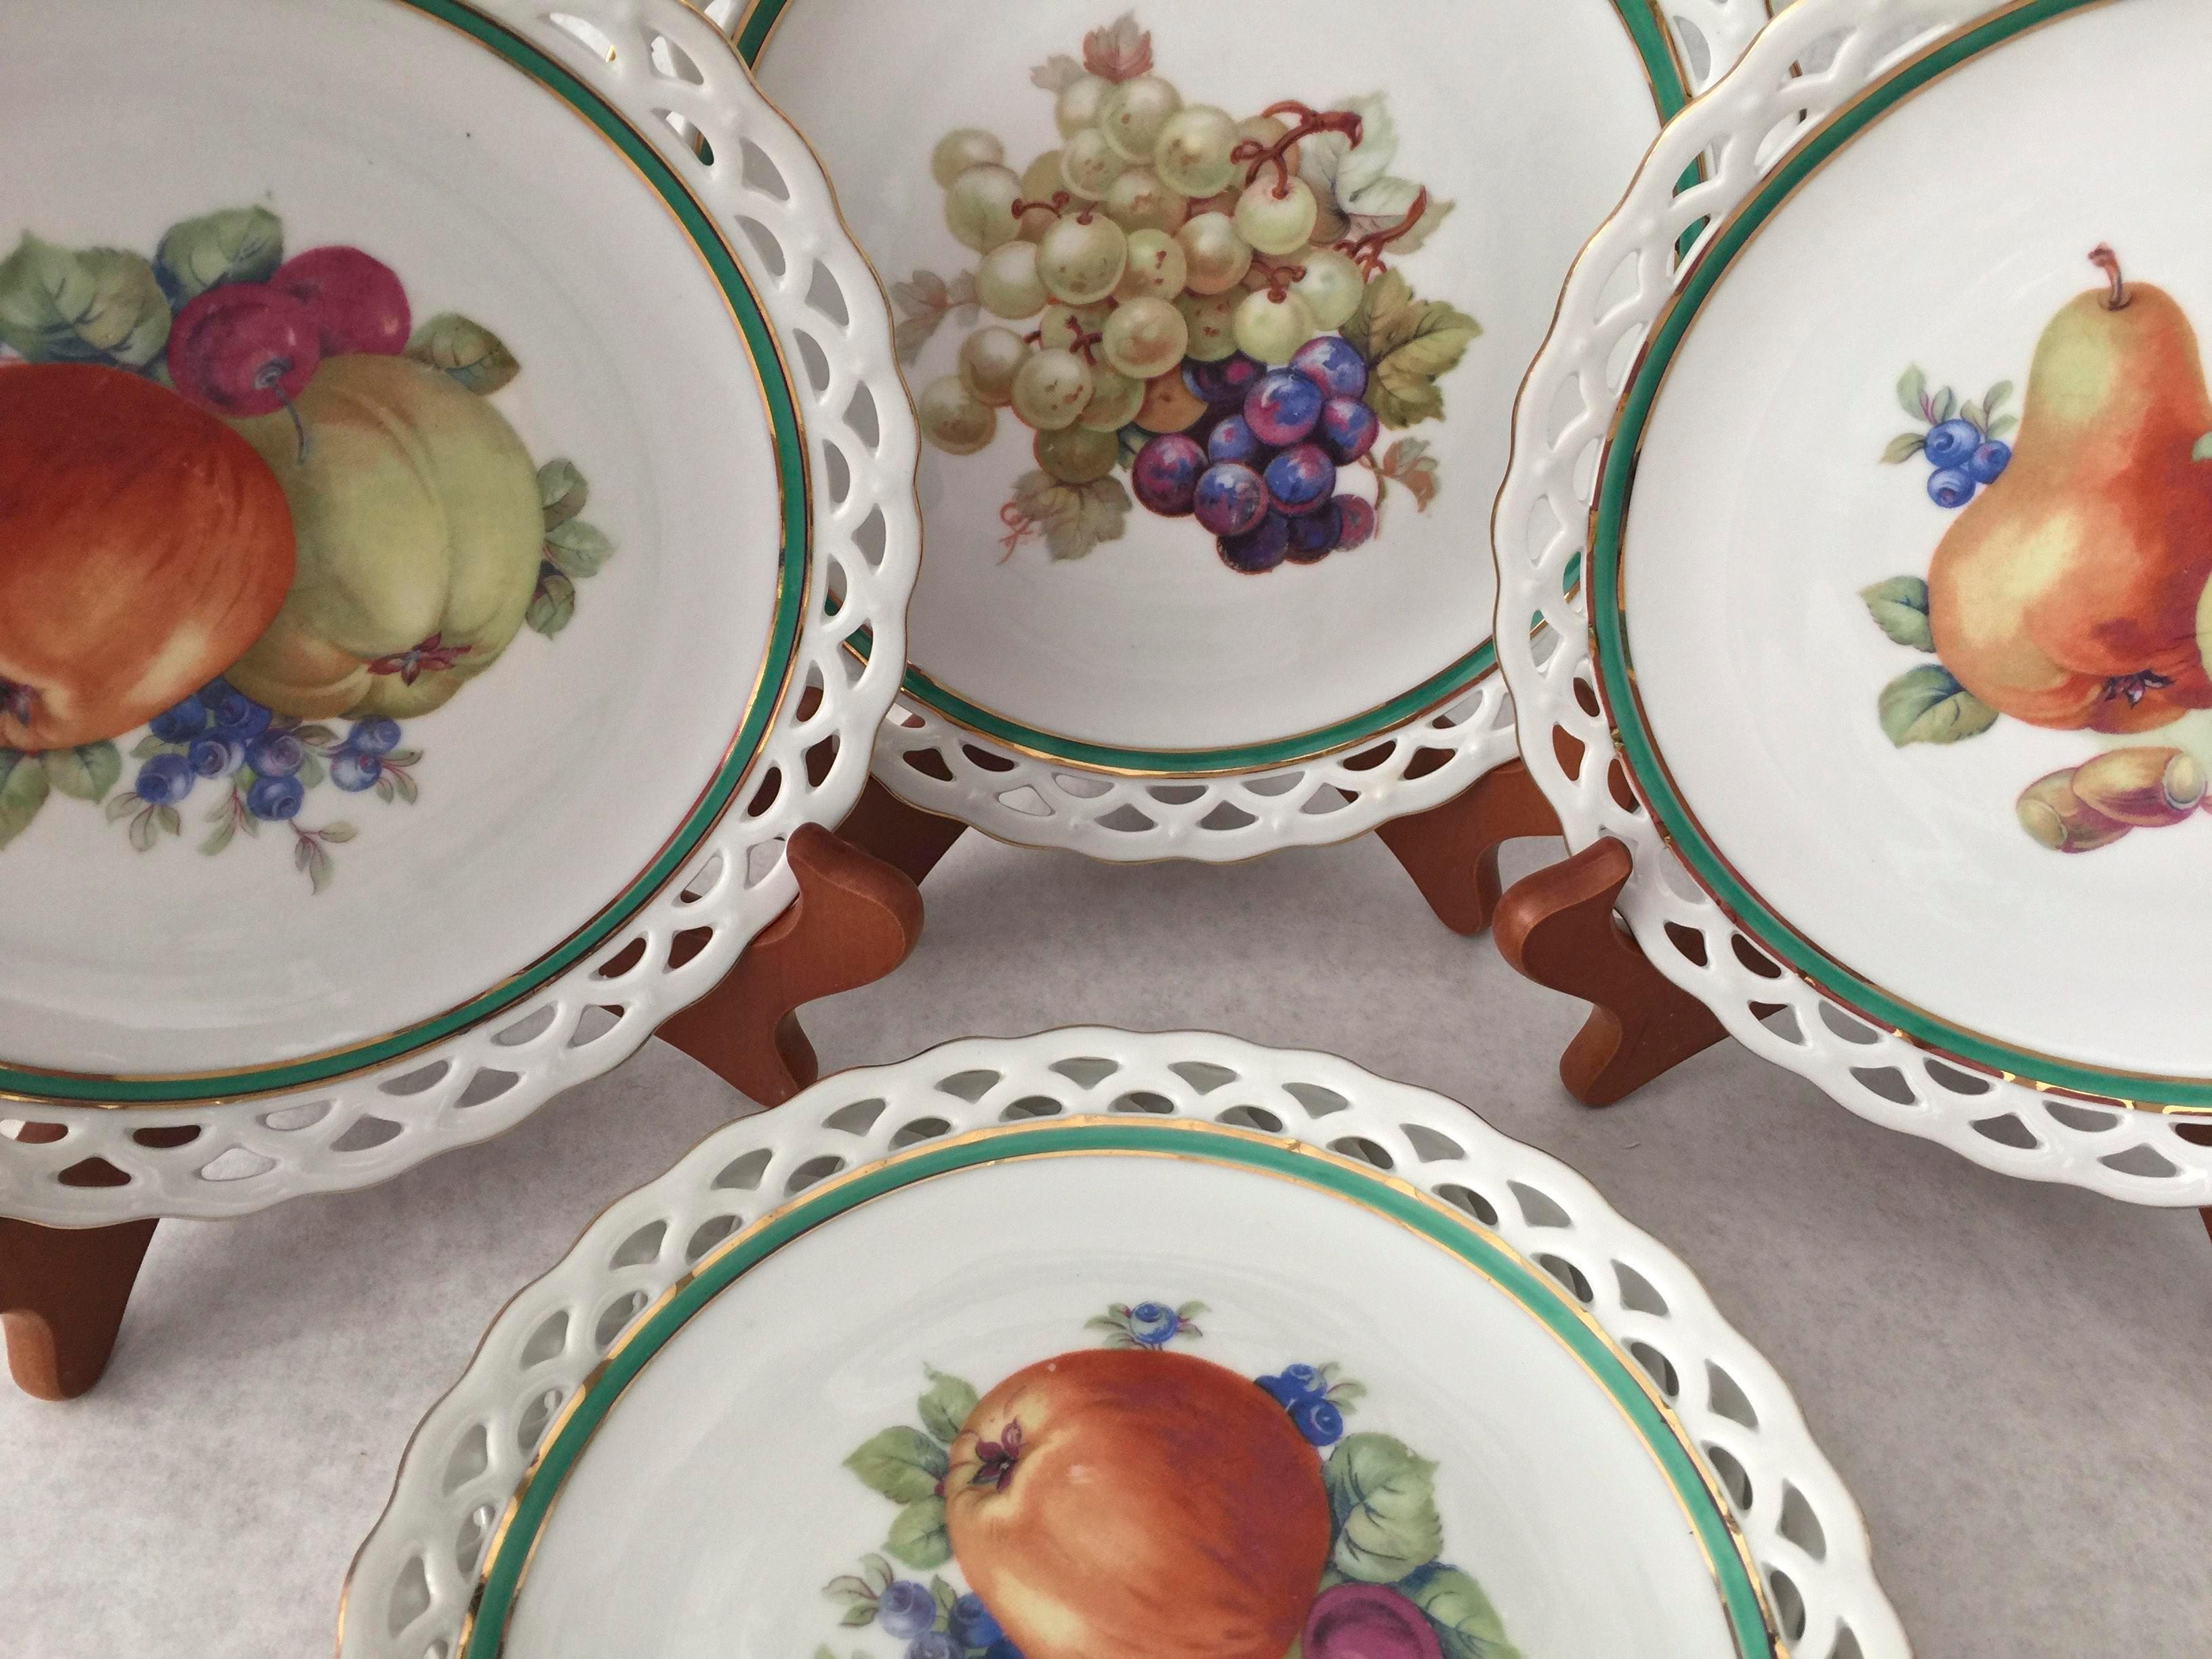 Vintage Winterling Bavaria Lace Dessert Plates - Set of 6 - Image 7 of 10  sc 1 st  Chairish & Vintage Winterling Bavaria Lace Dessert Plates - Set of 6 | Chairish